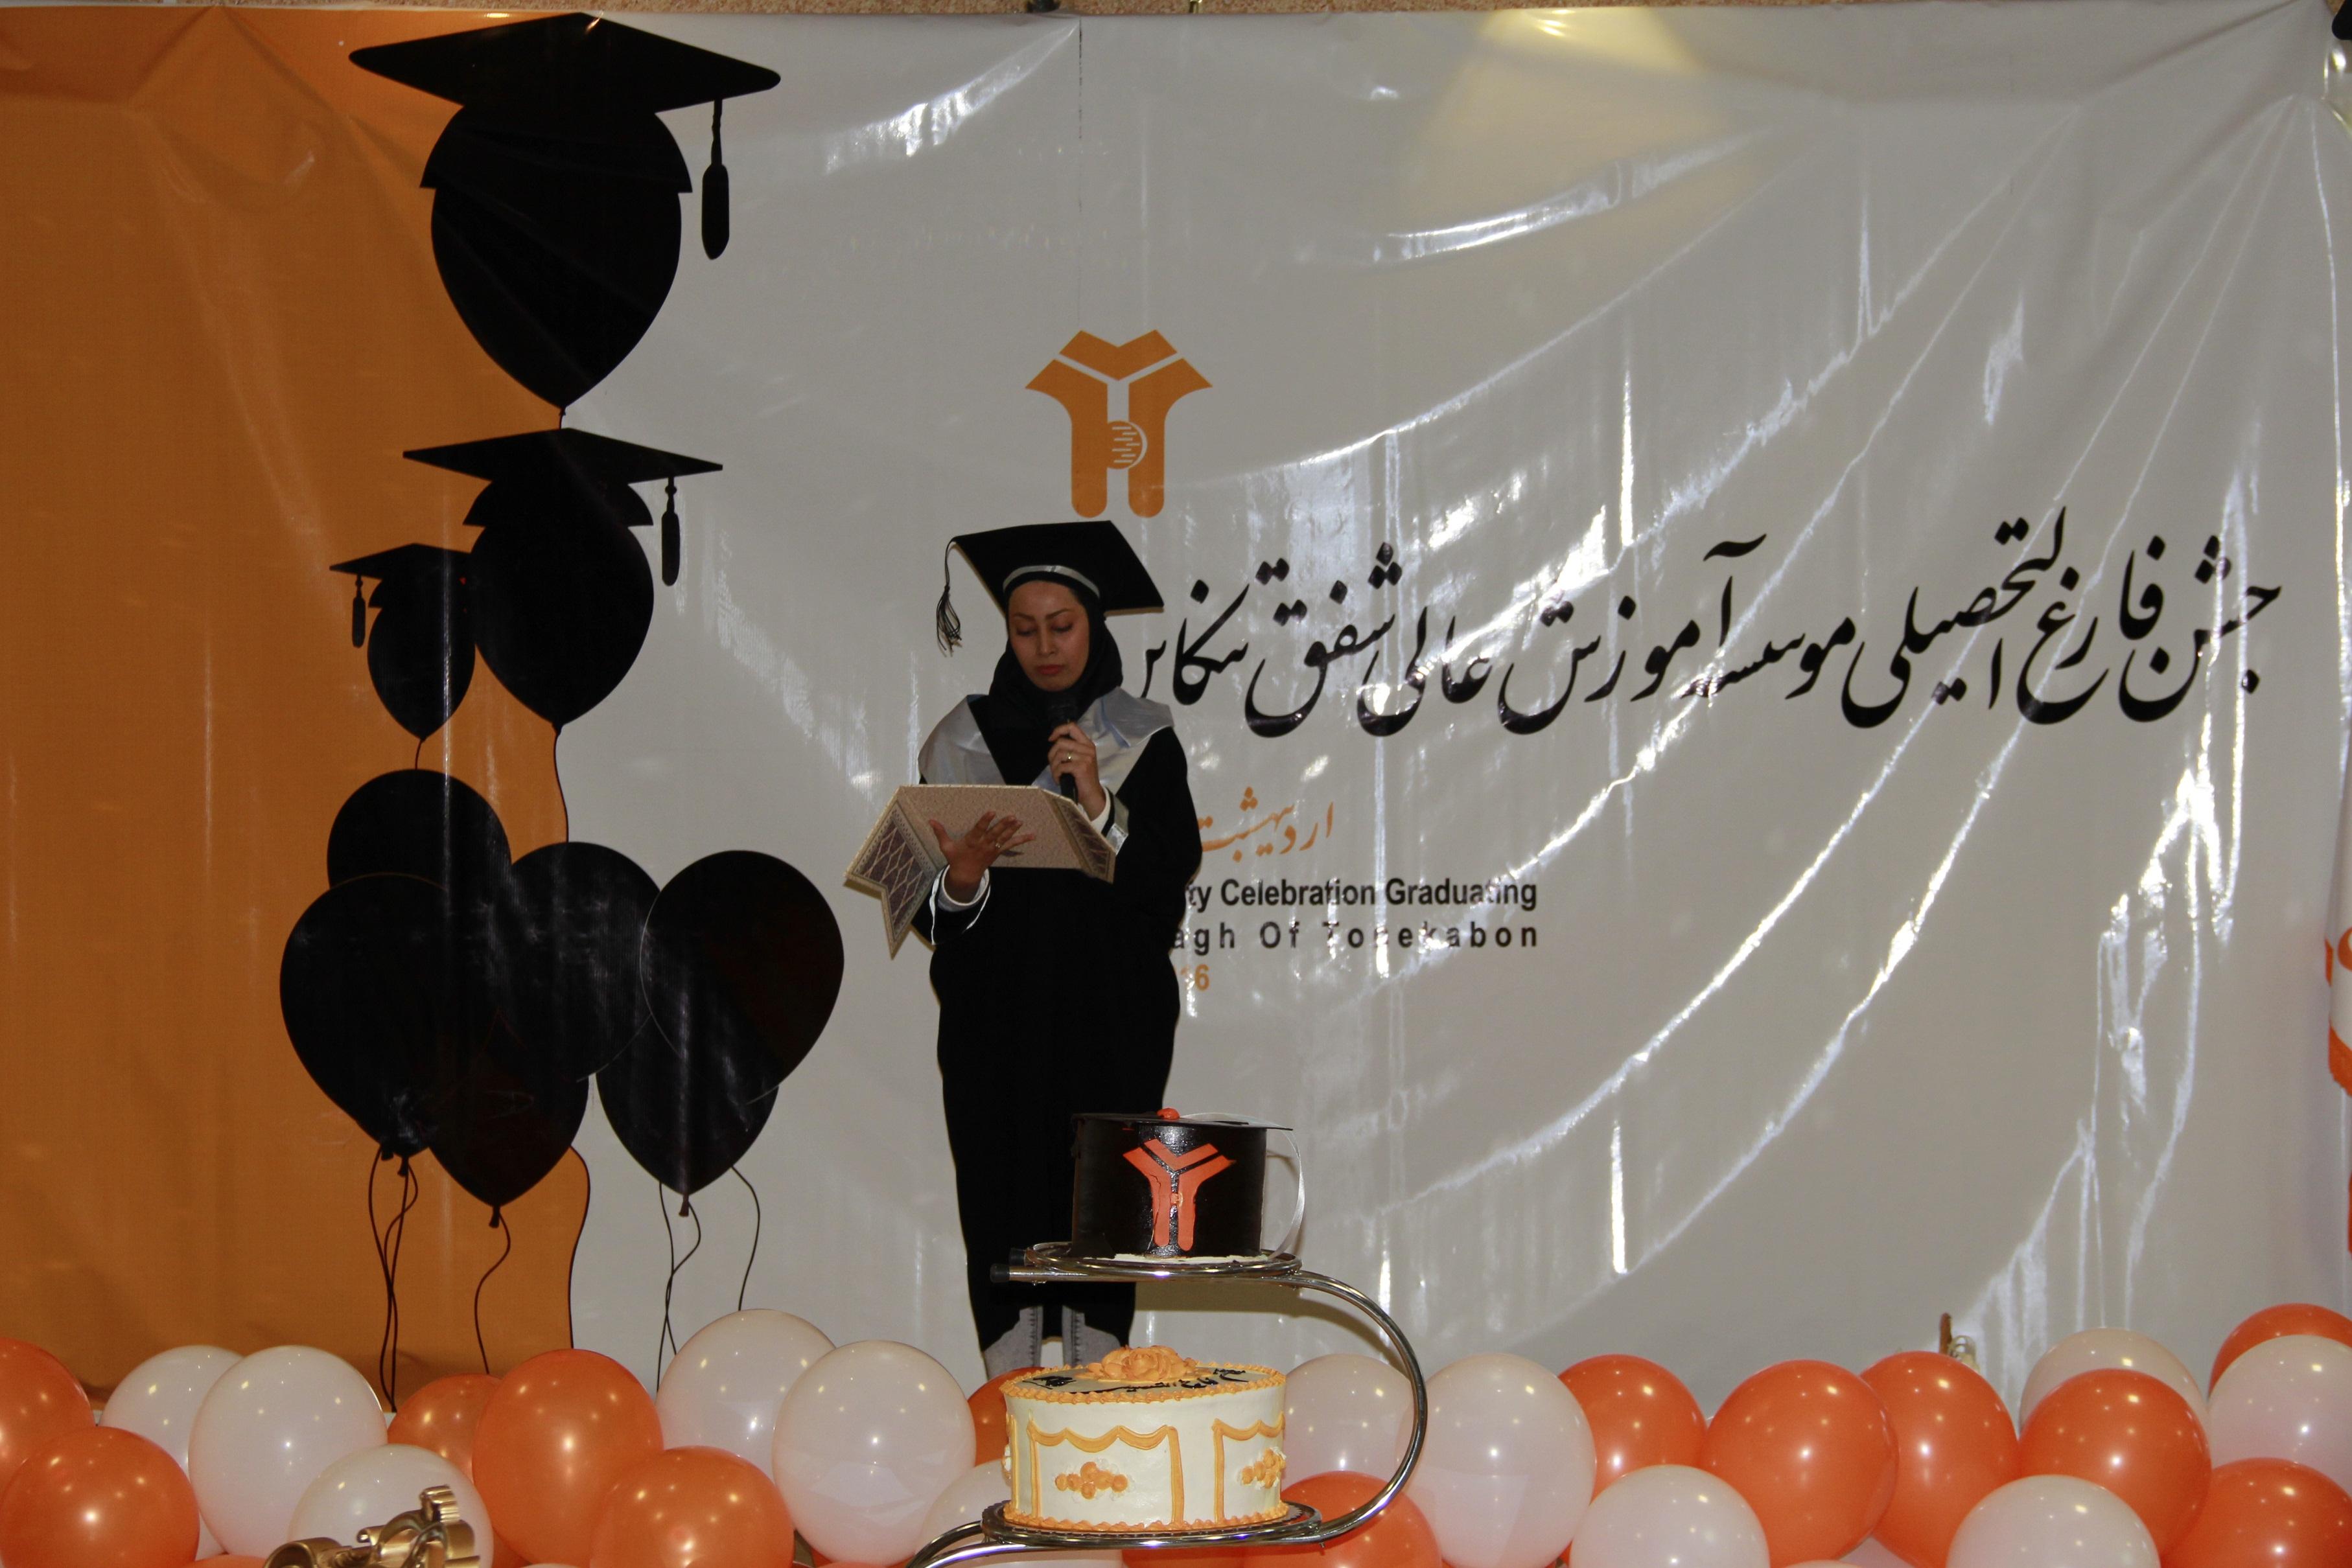 جشن فارغ التحصیلی موسسه آموزش عالی شفق تنکابن